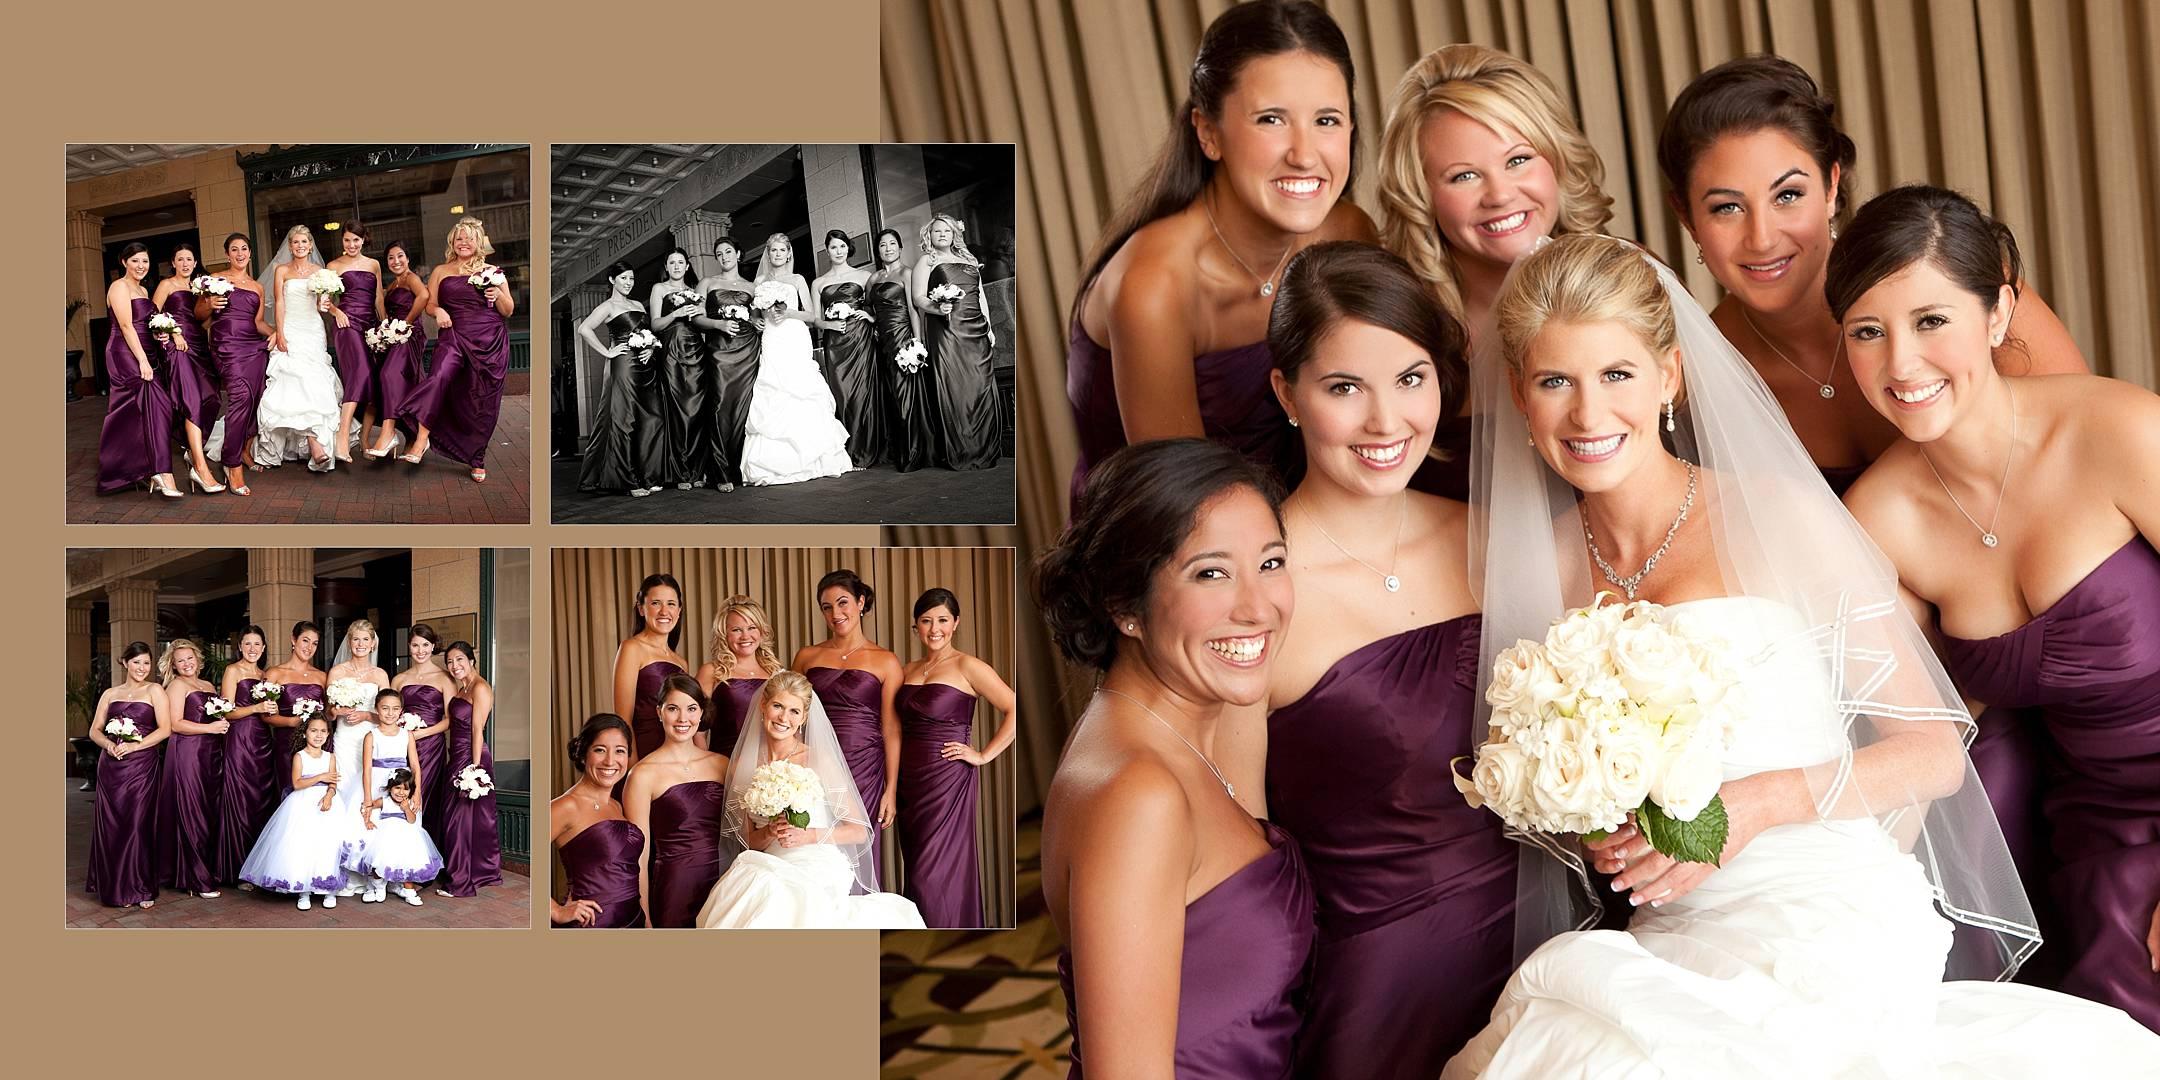 schmidt-photo-wedding-photography-chicago_2294